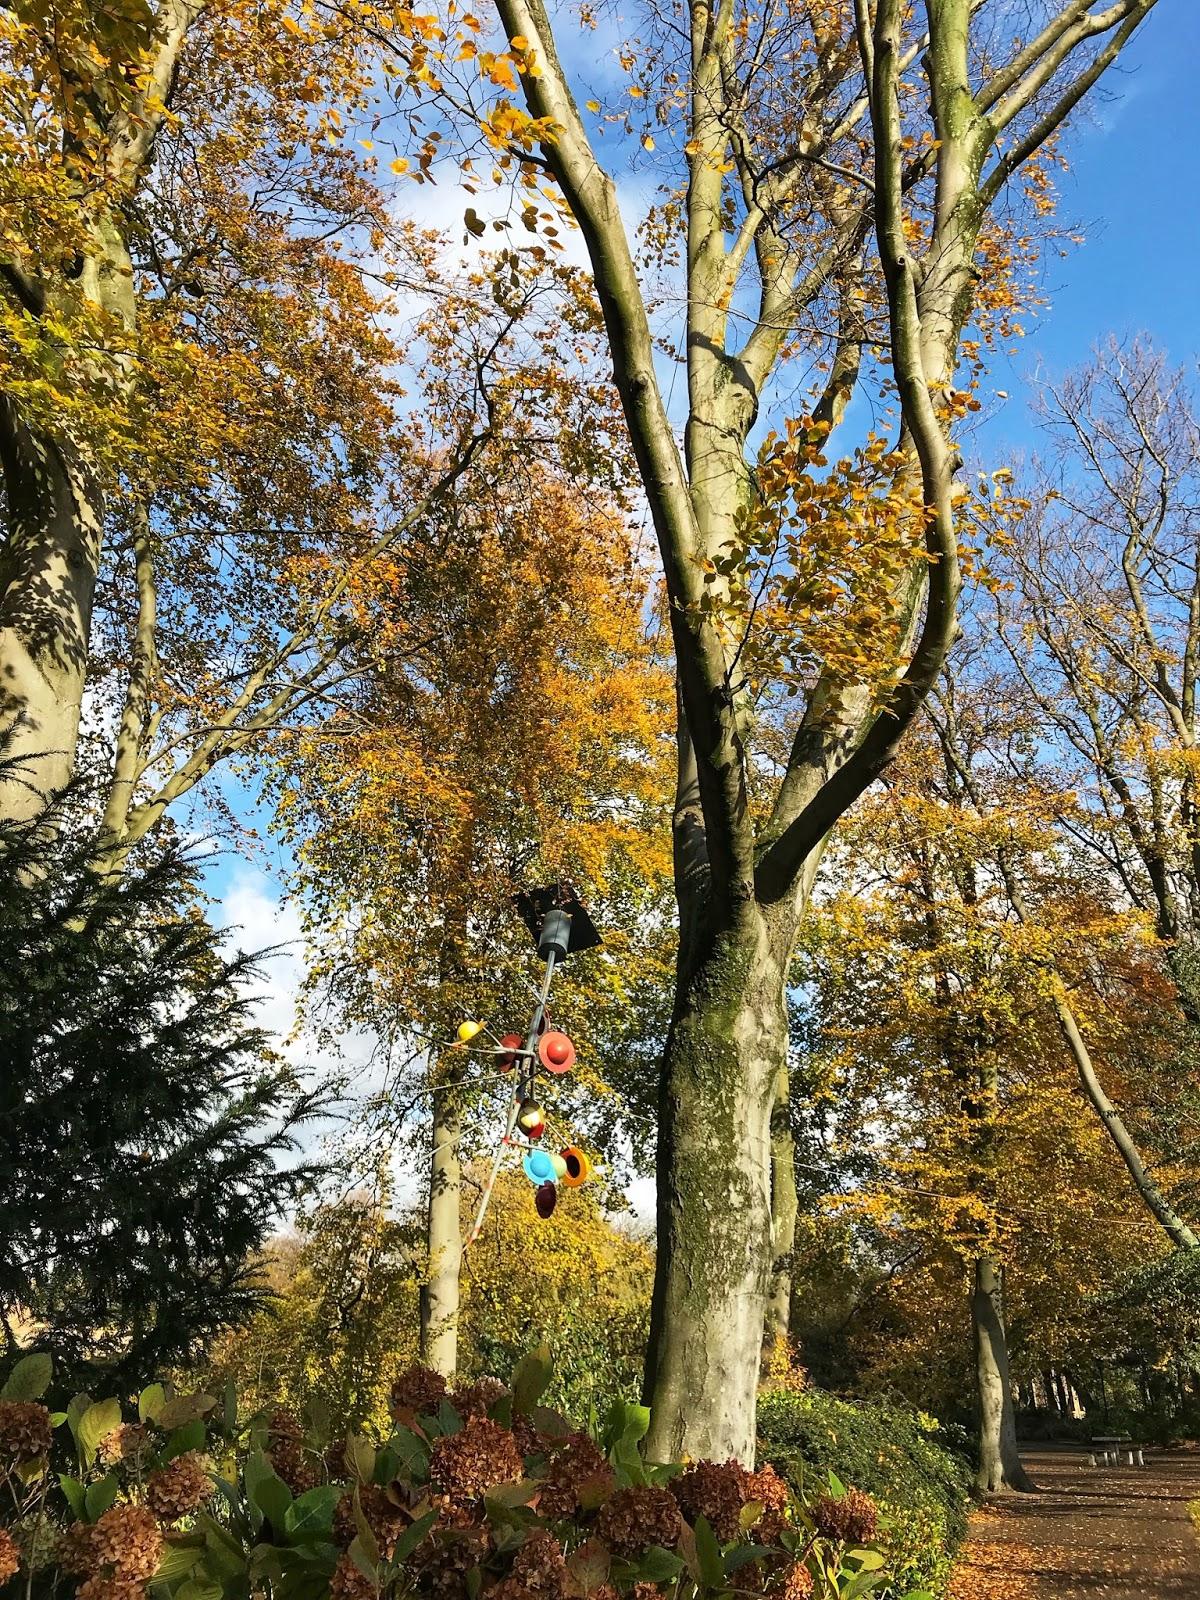 Autumn in The Hague